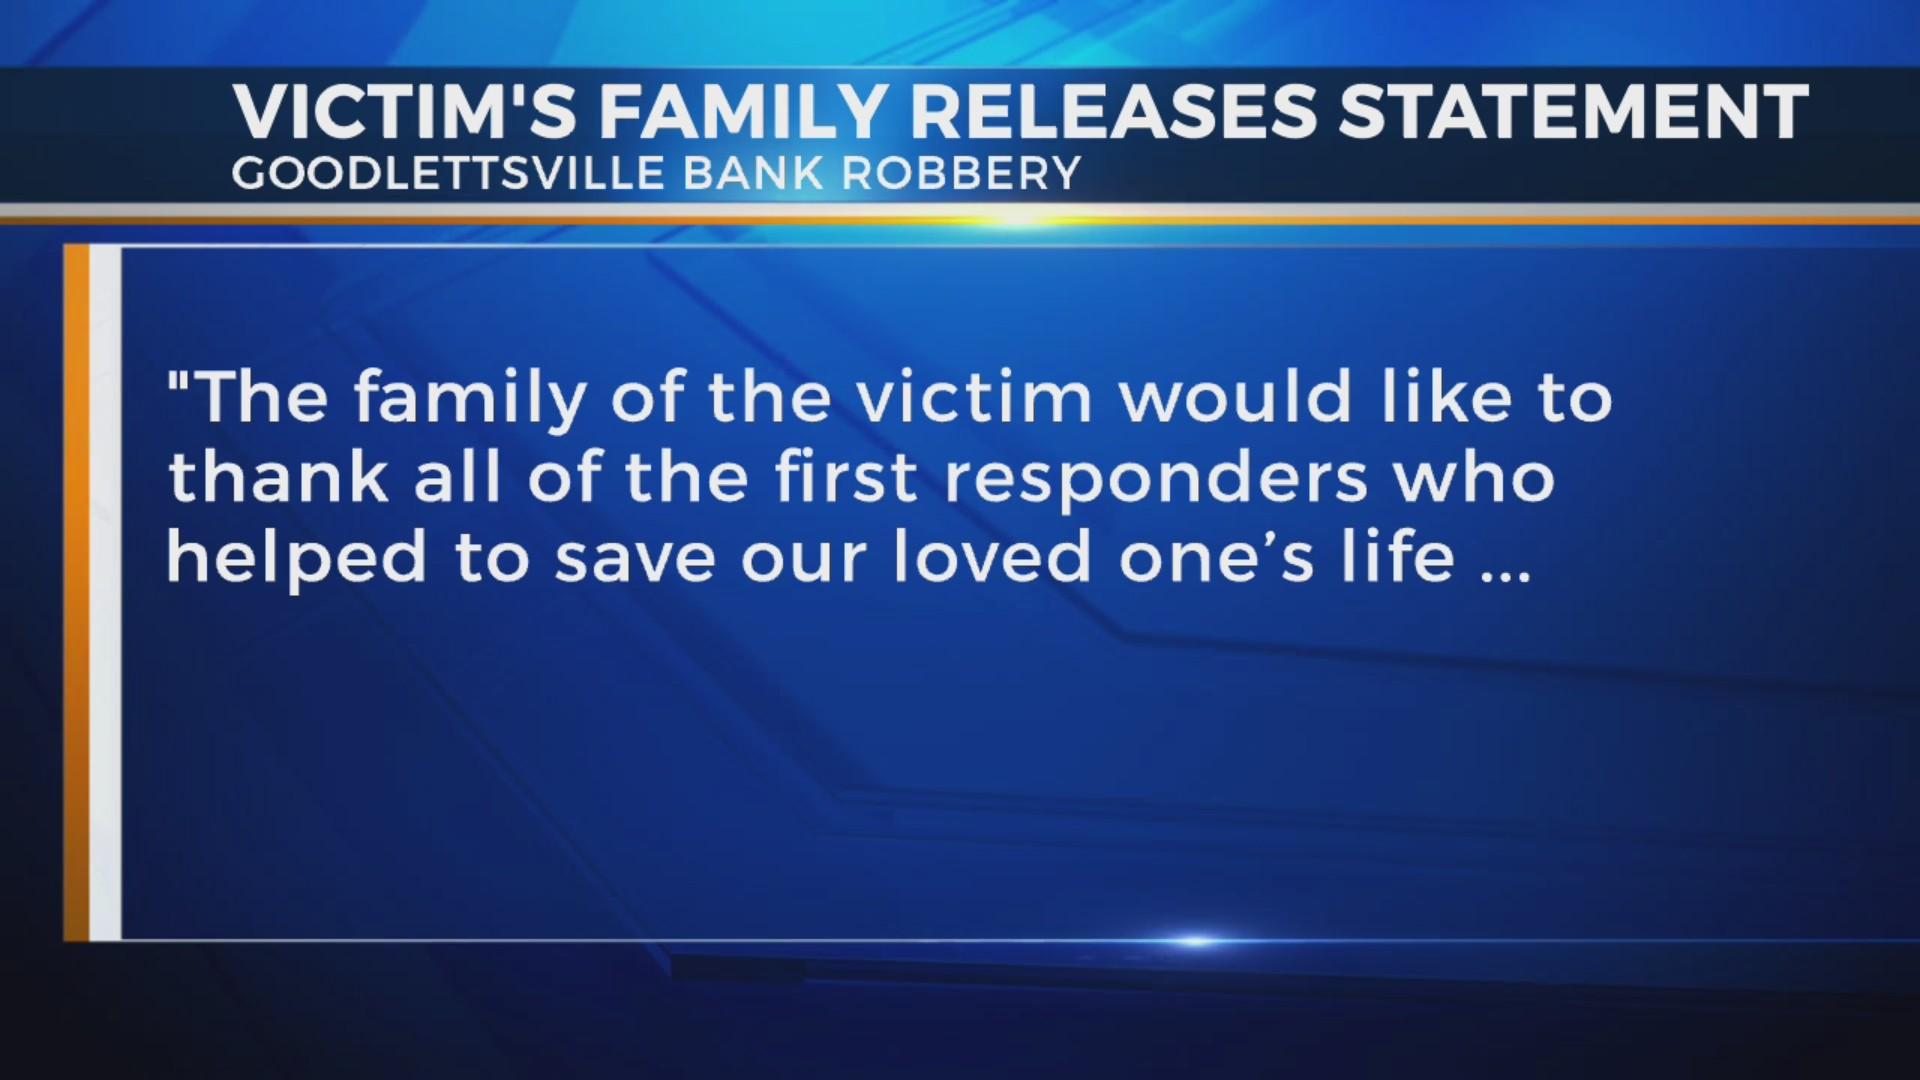 Family statement